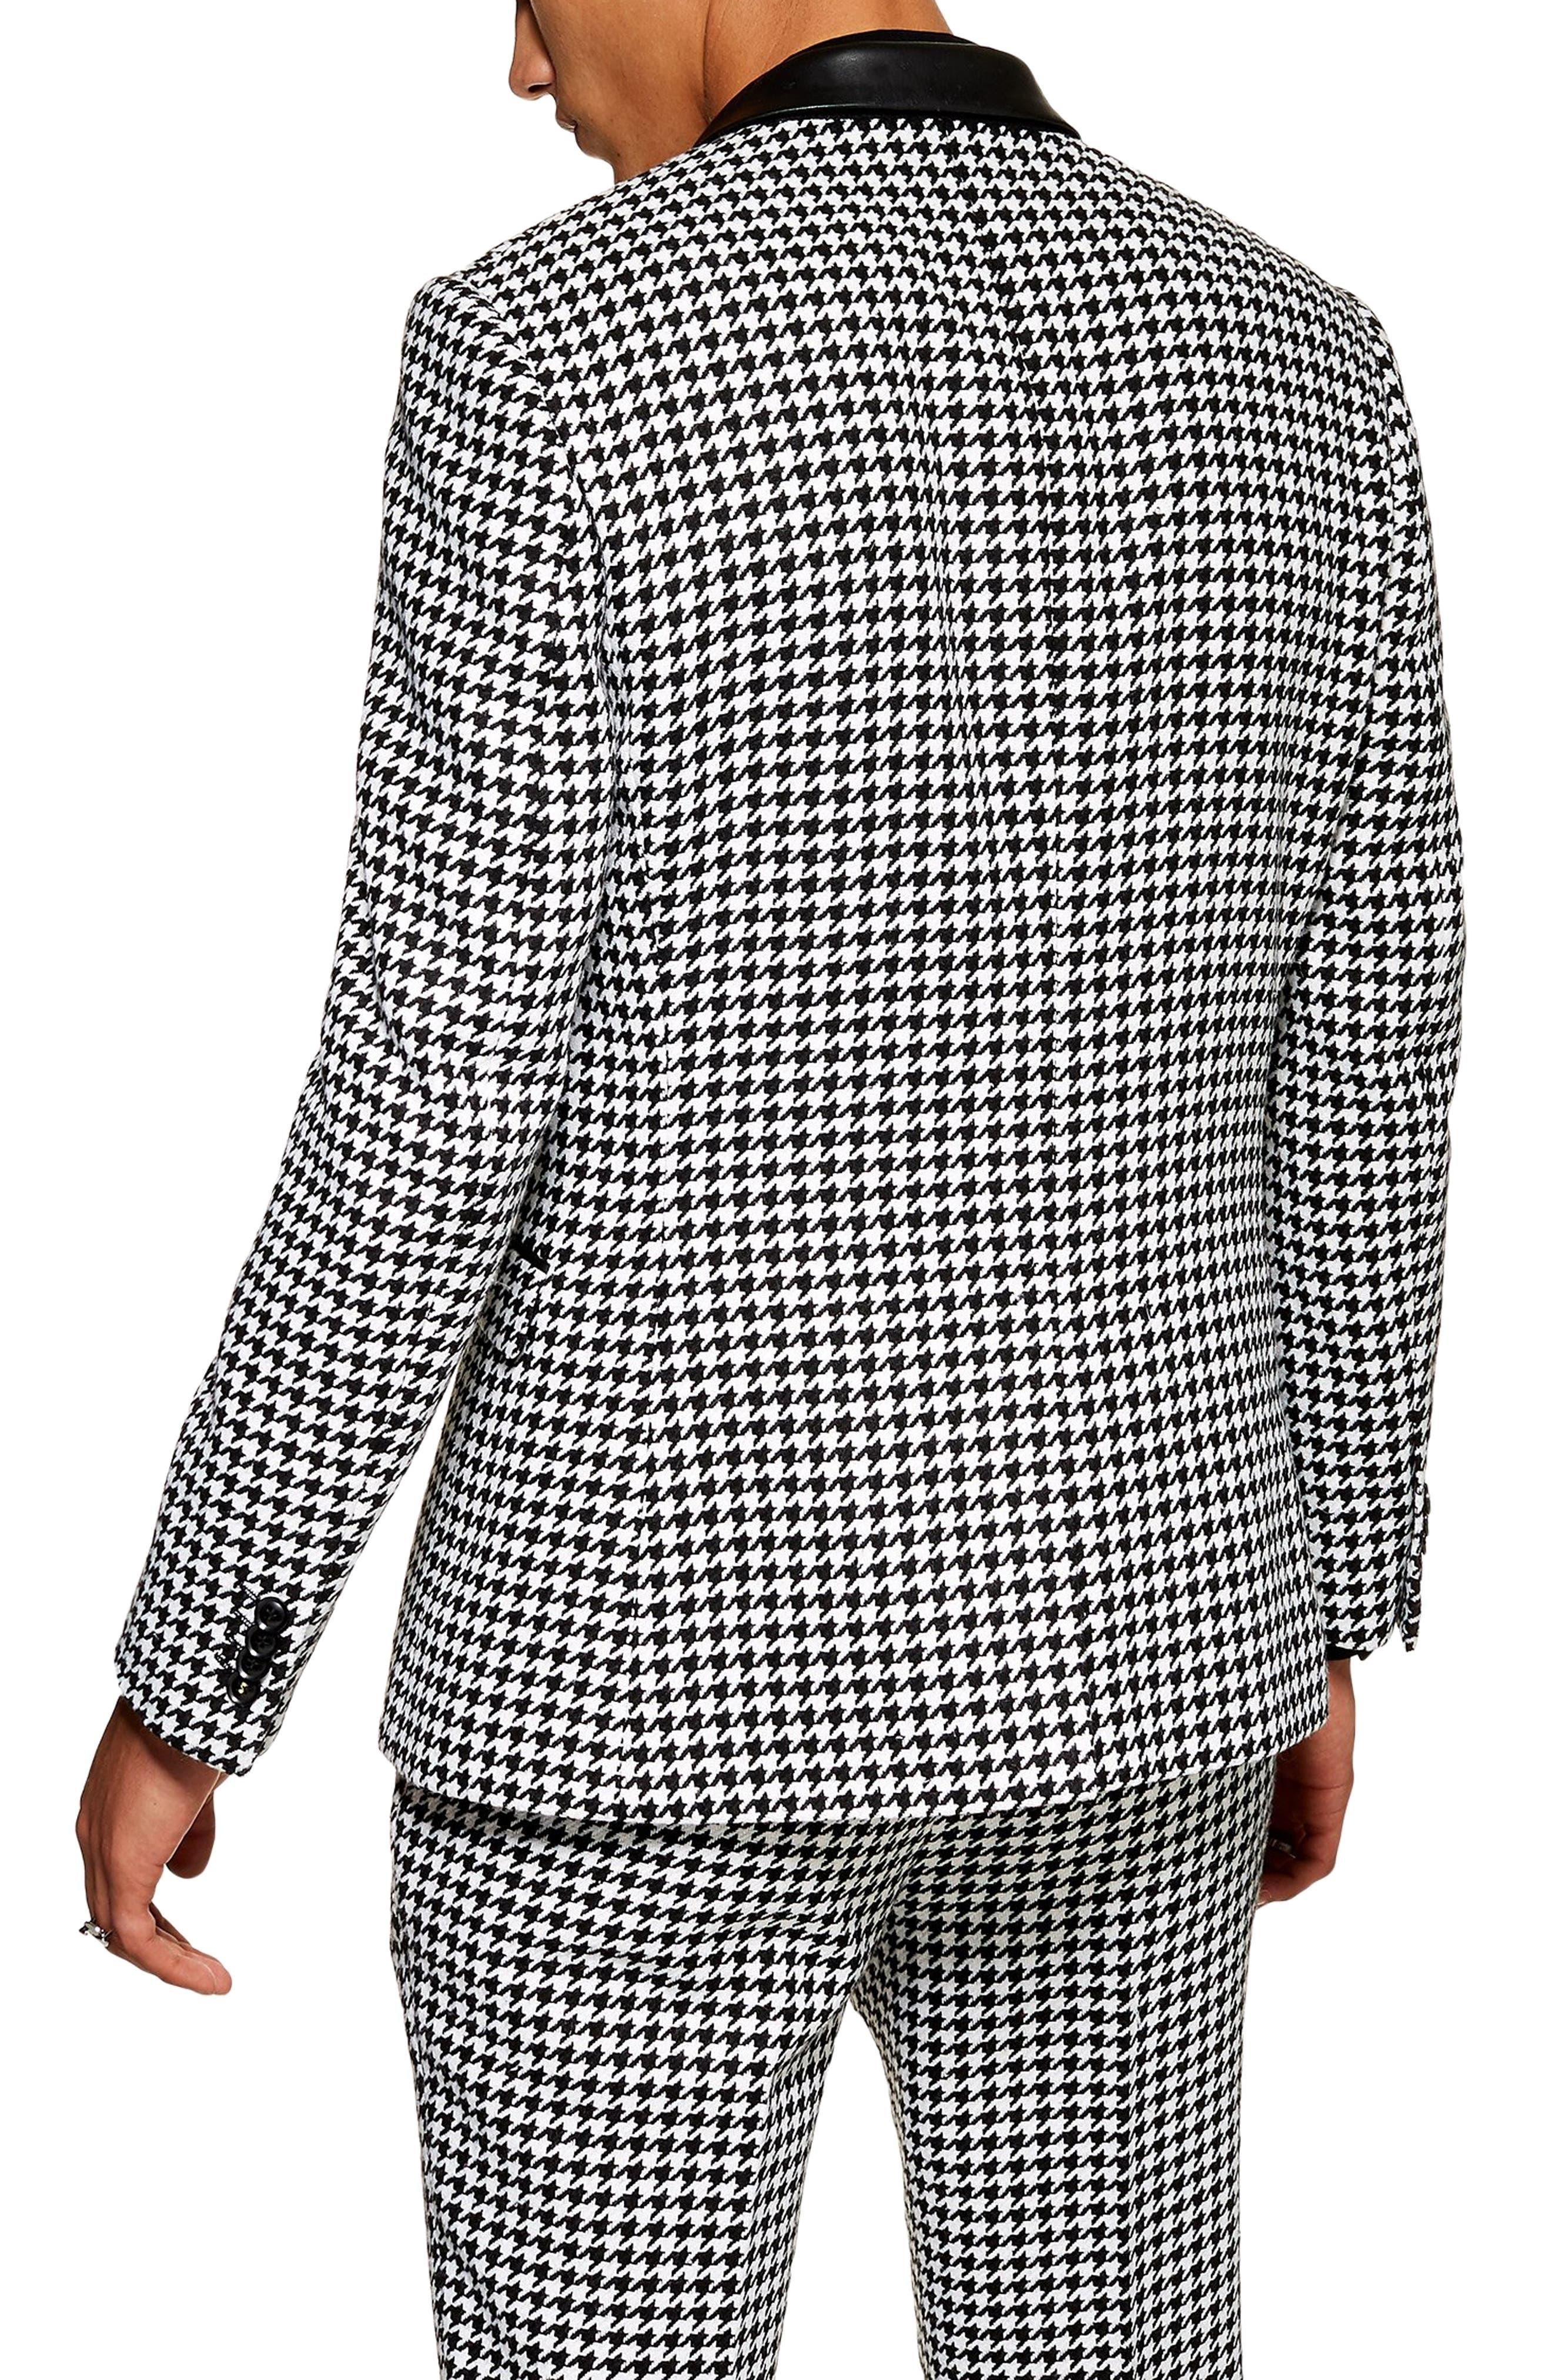 Roe Skinny Fit Suit Jacket,                             Alternate thumbnail 2, color,                             BLACK MULTI